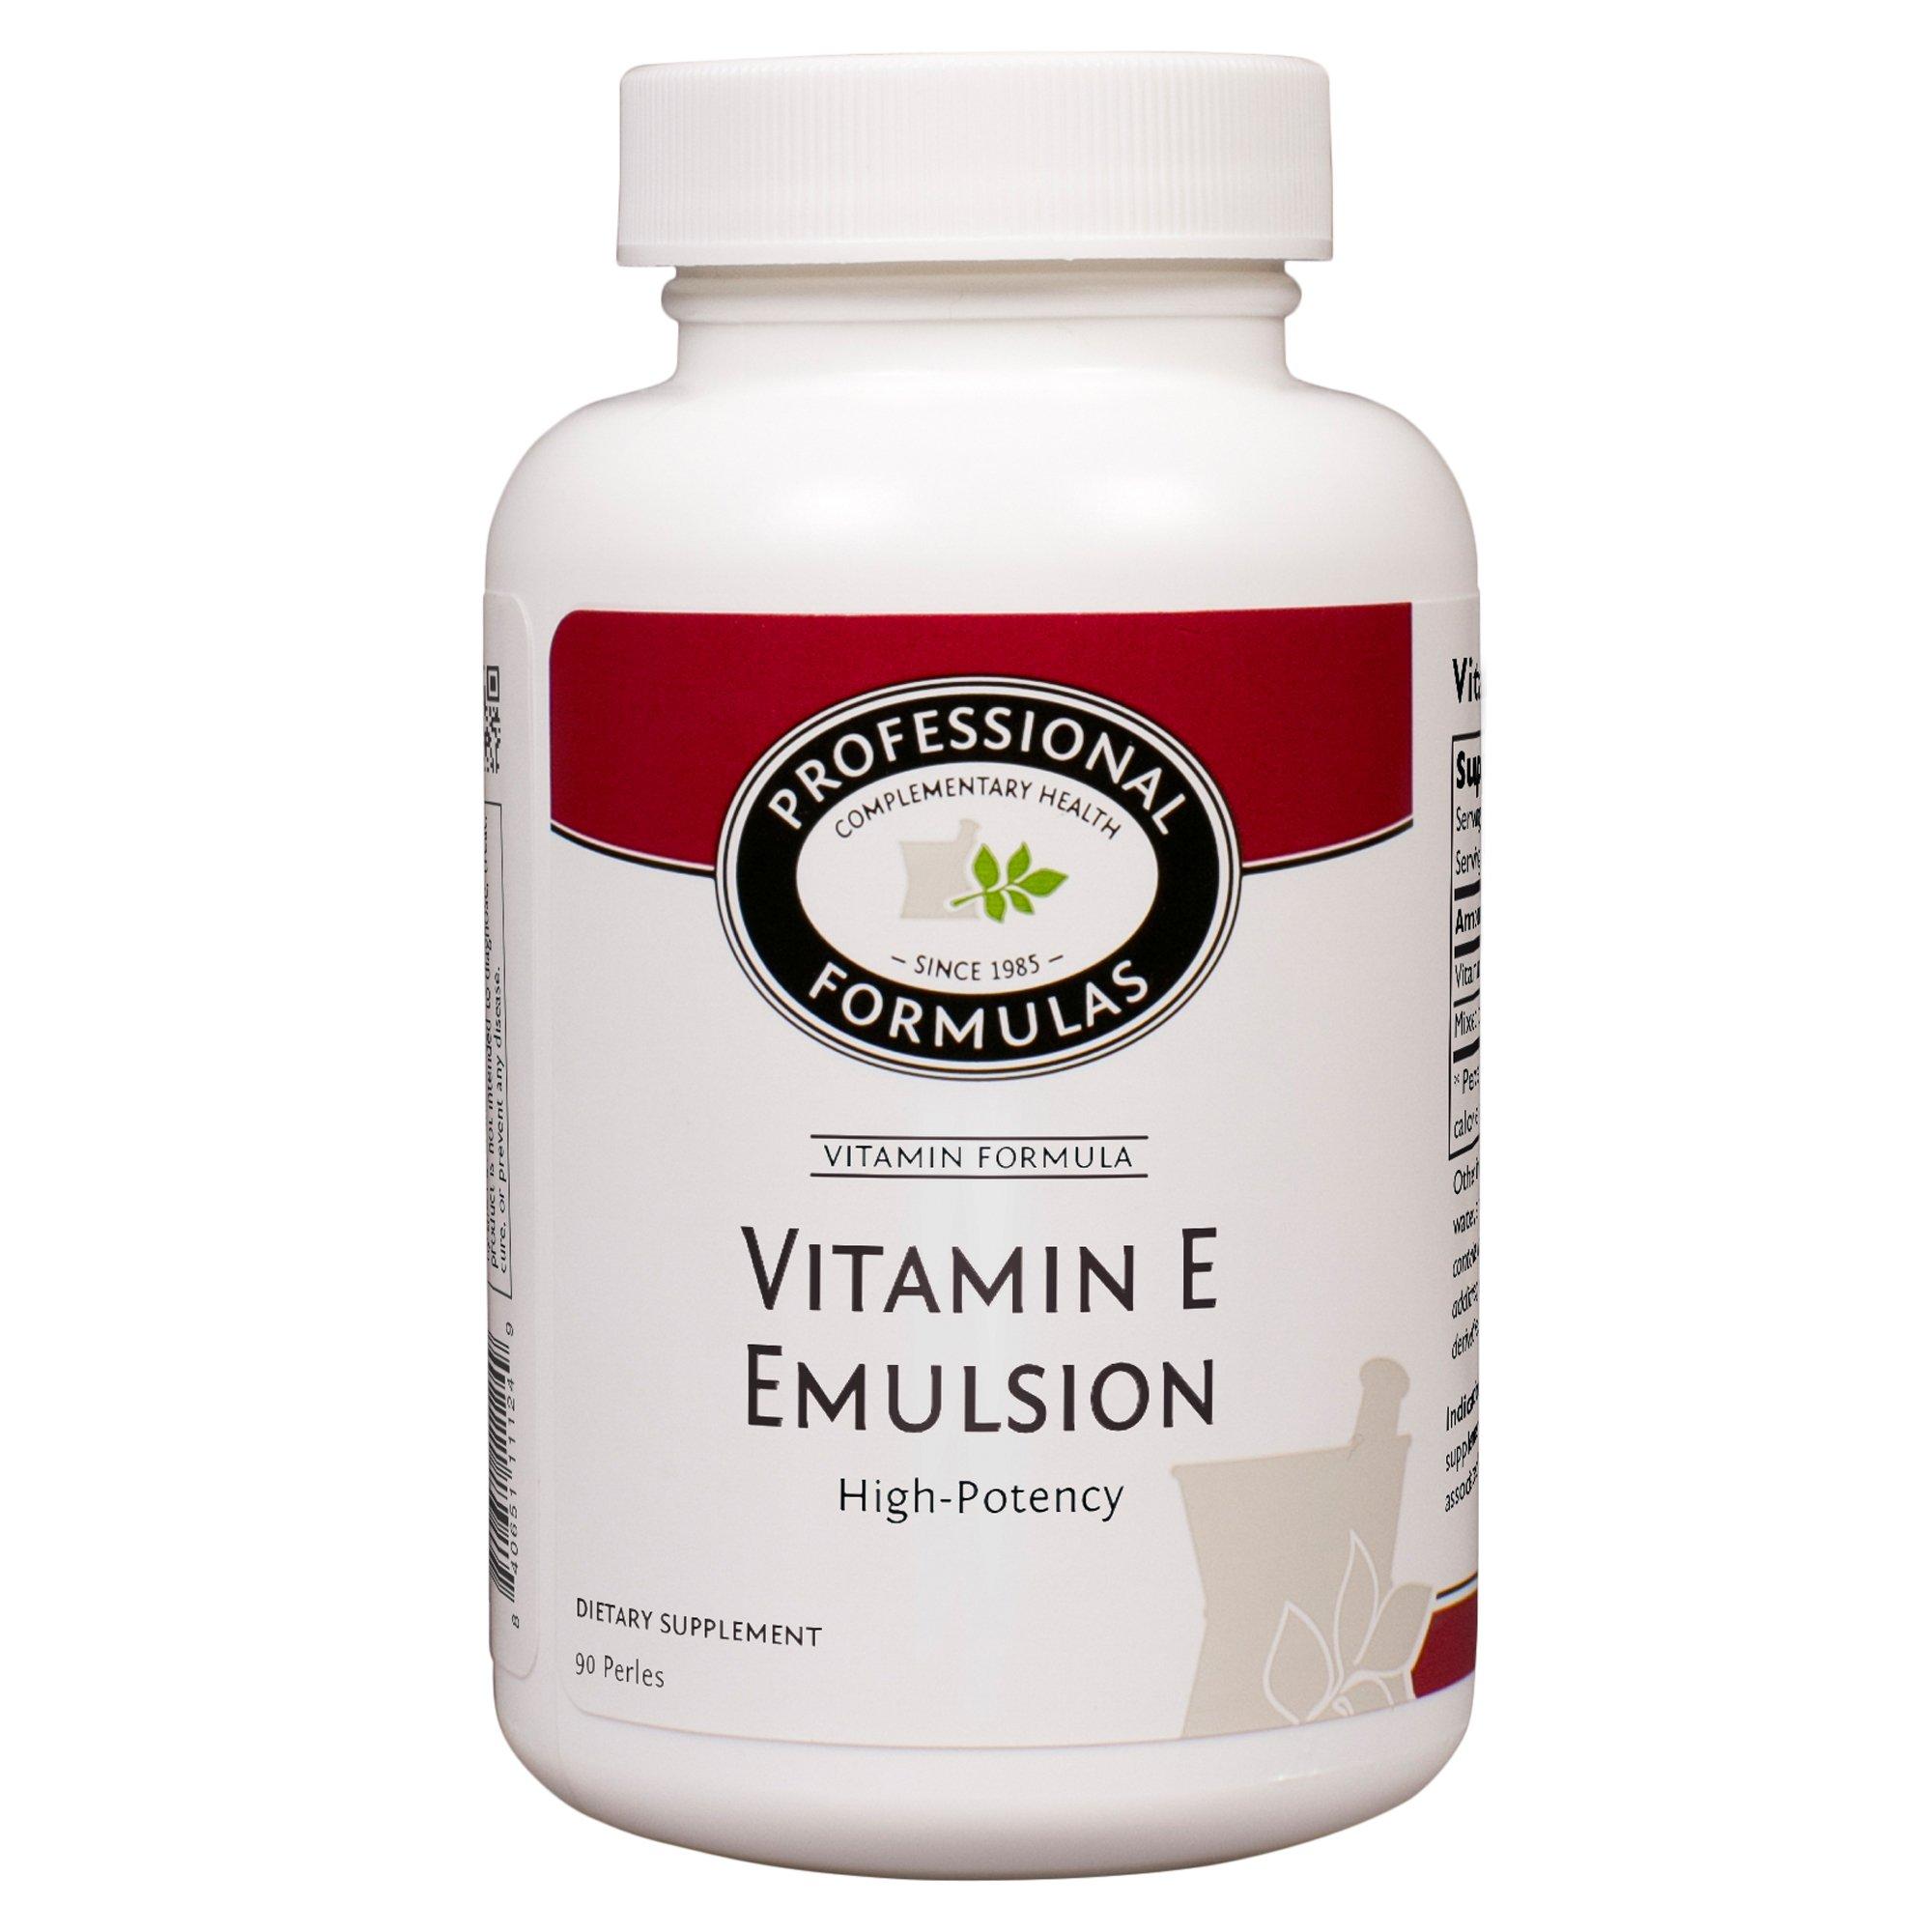 Professional Formulas, Vitamin E Emulsion 400, 90 Perles